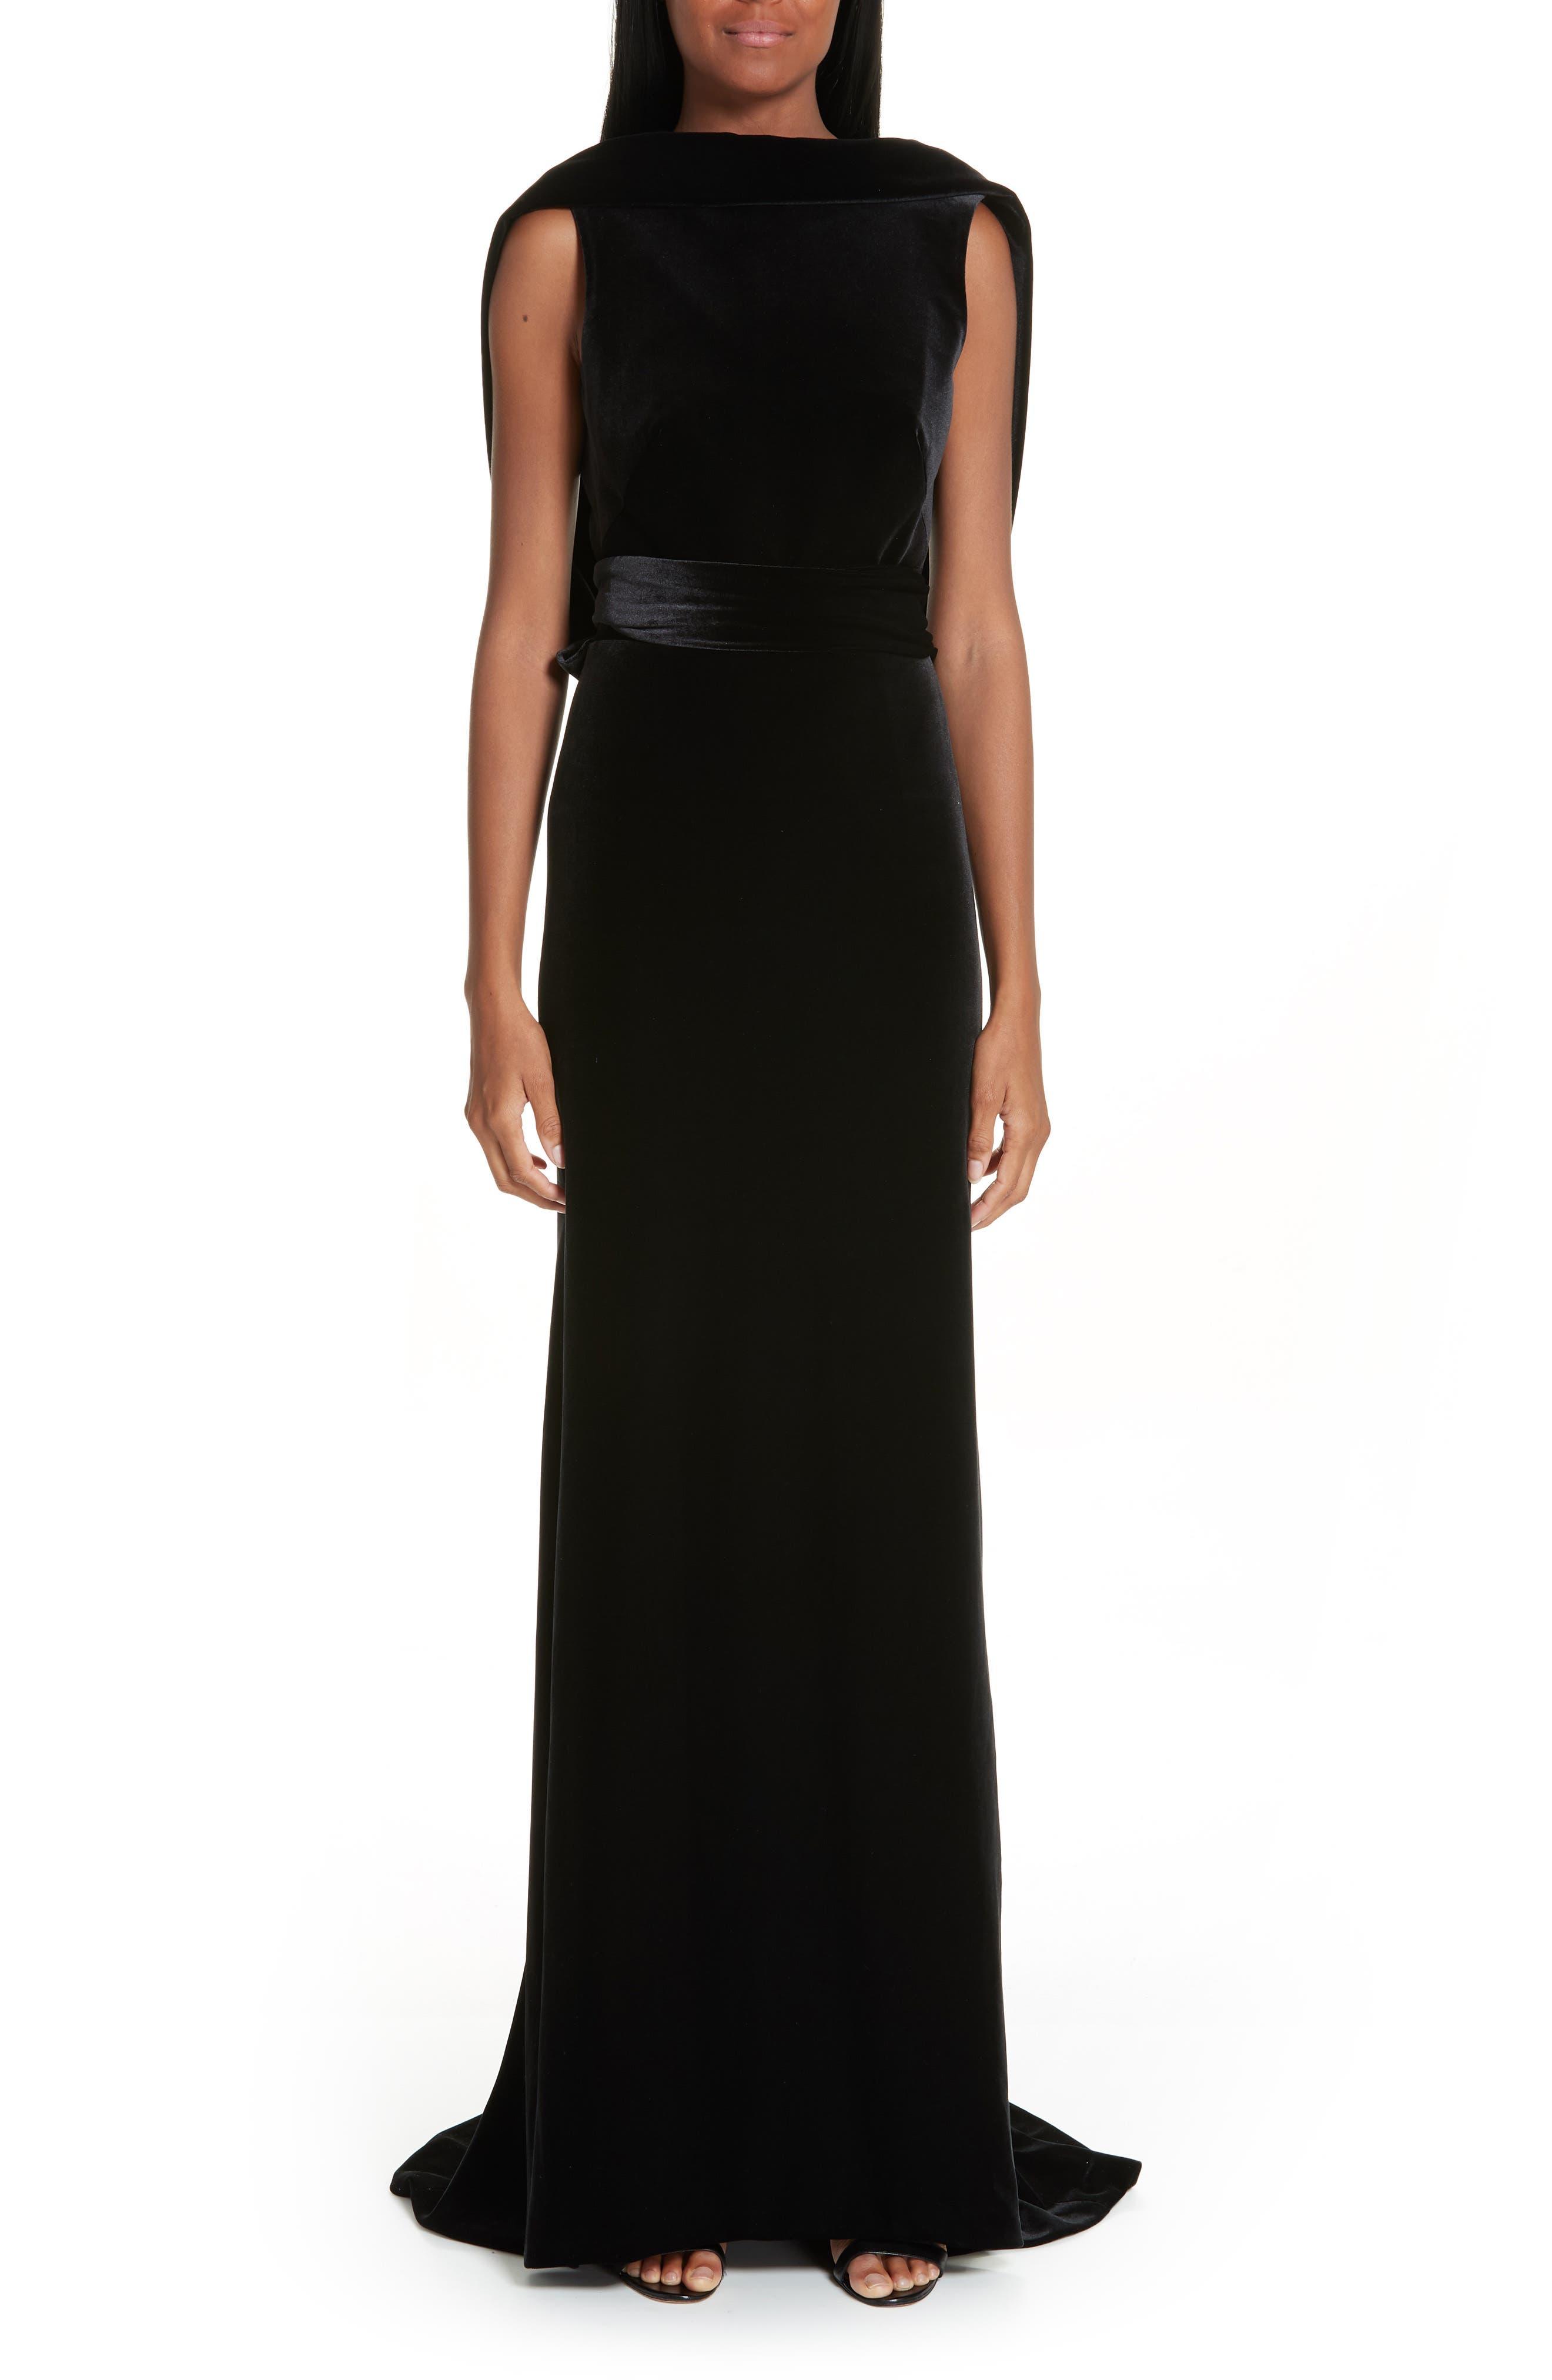 BRANDON MAXWELL Sleeveless Drape-Back Column Evening Gown in Black